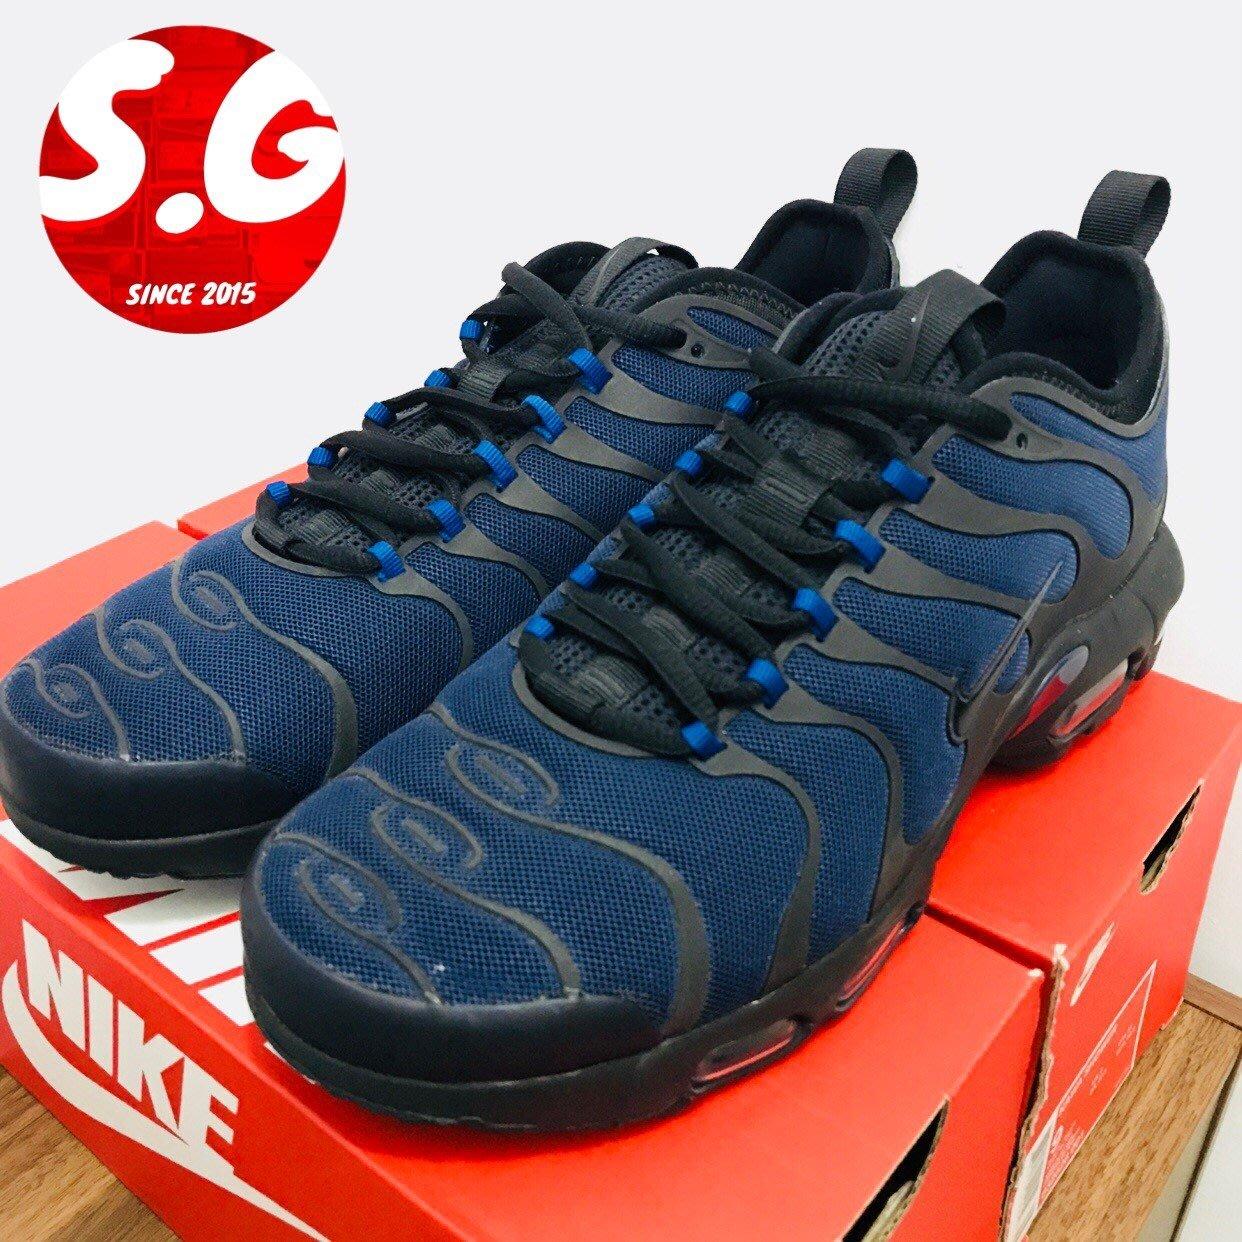 S.G NIKE AIR MAX PLUS TN ULTRA 復古 休閒 氣墊 反光 藍 黑 男鞋 898015 404